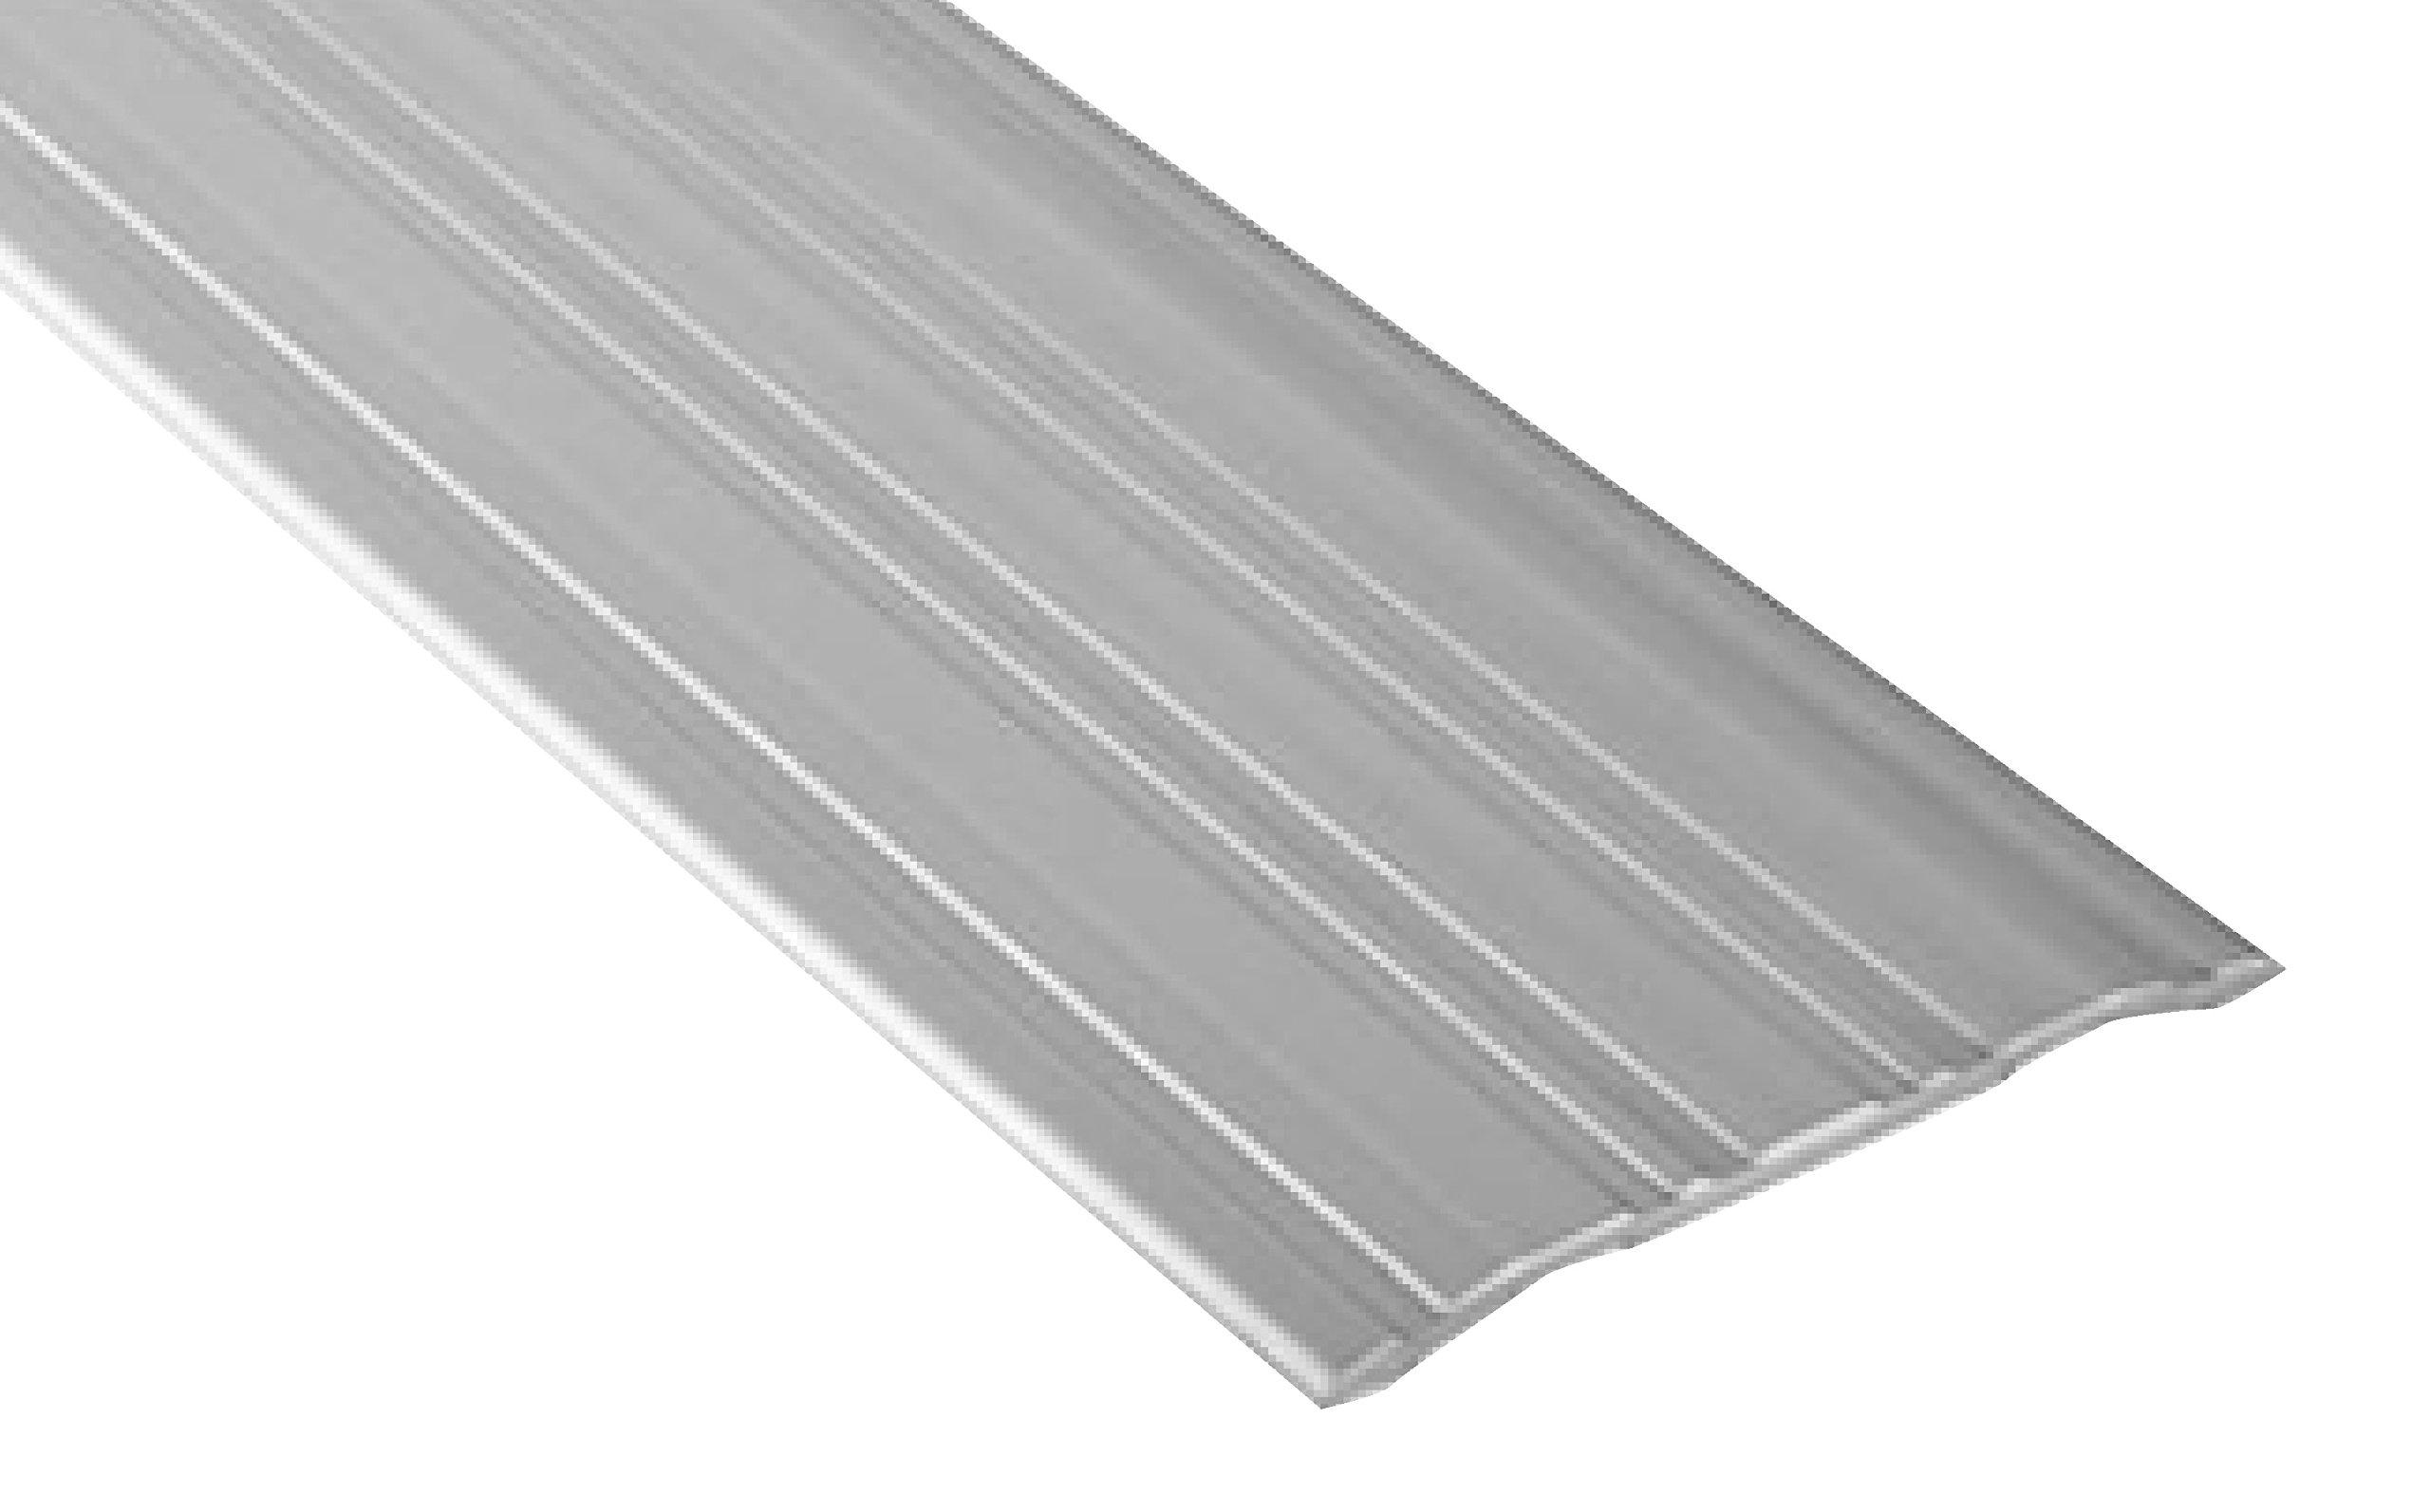 Pemko 085604 270A72 Saddle Threshold, Mill Finish Aluminum, 4'' width, 72'' Length, Aluminum